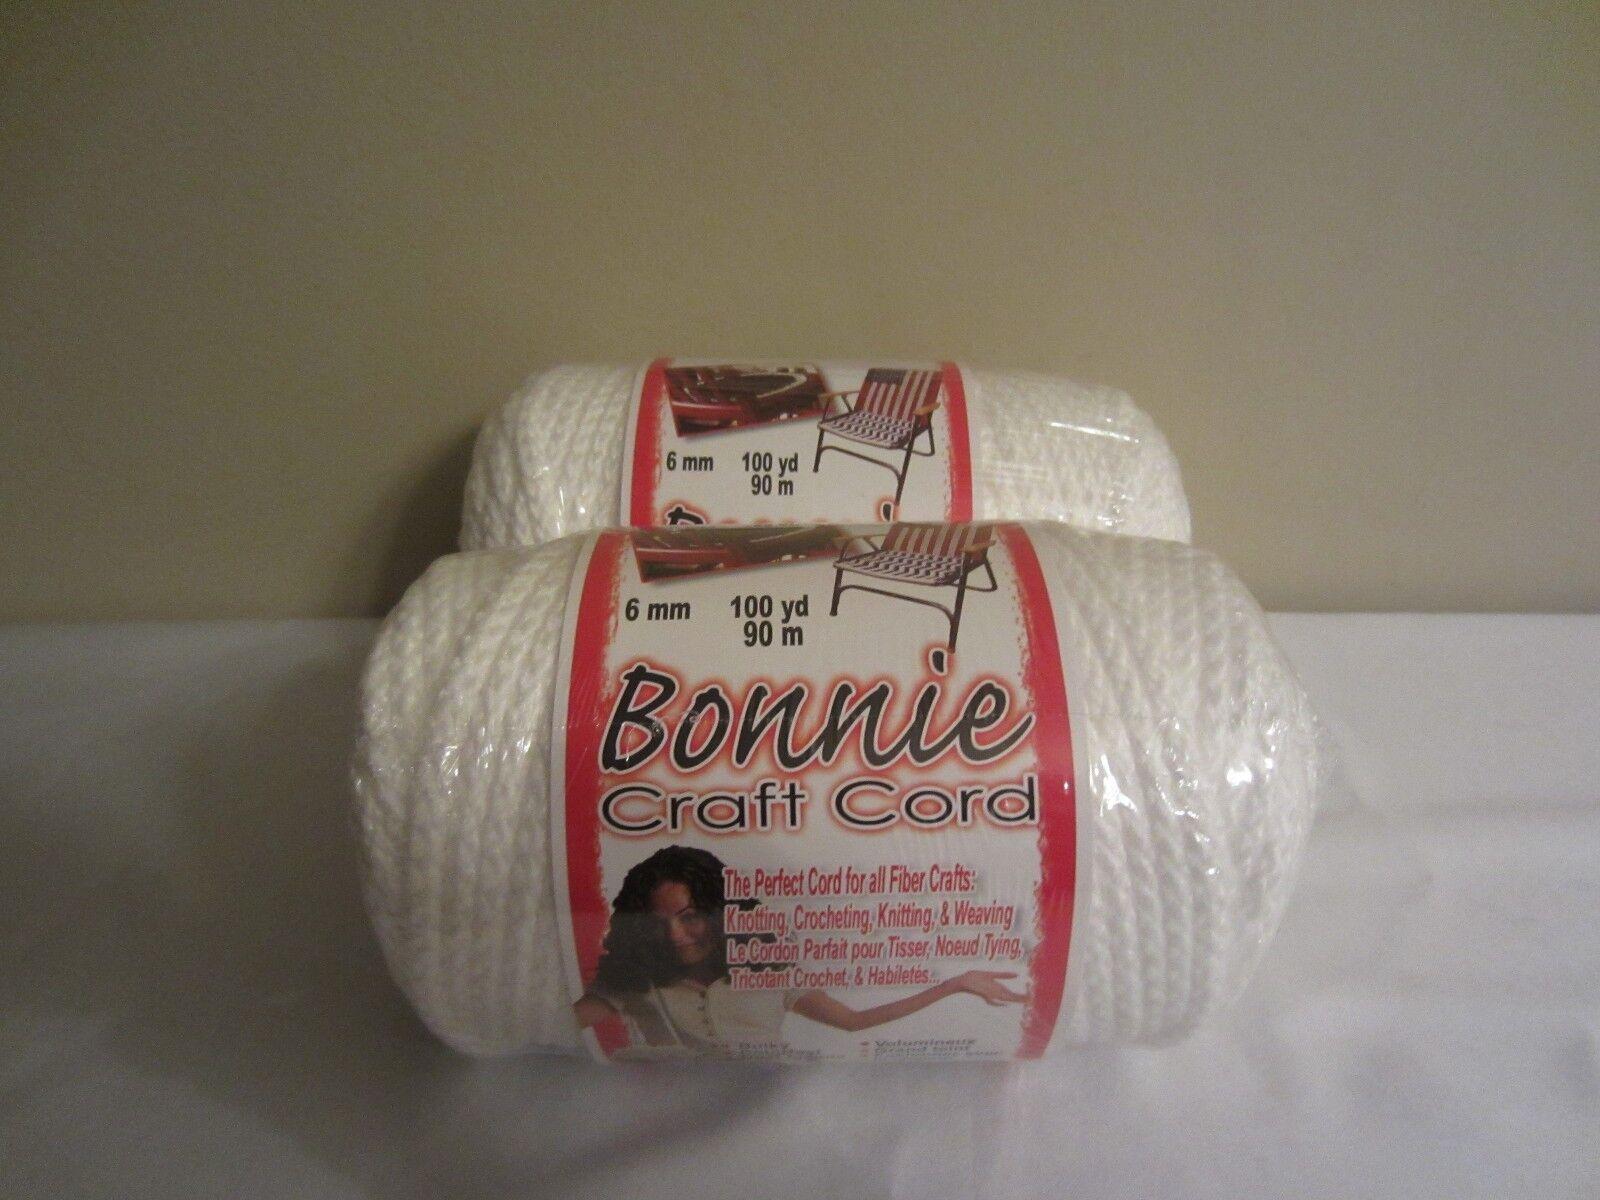 Bonnie craft cord 6mm - Lot Of 2 Rolls Of White 6mm Bonnie